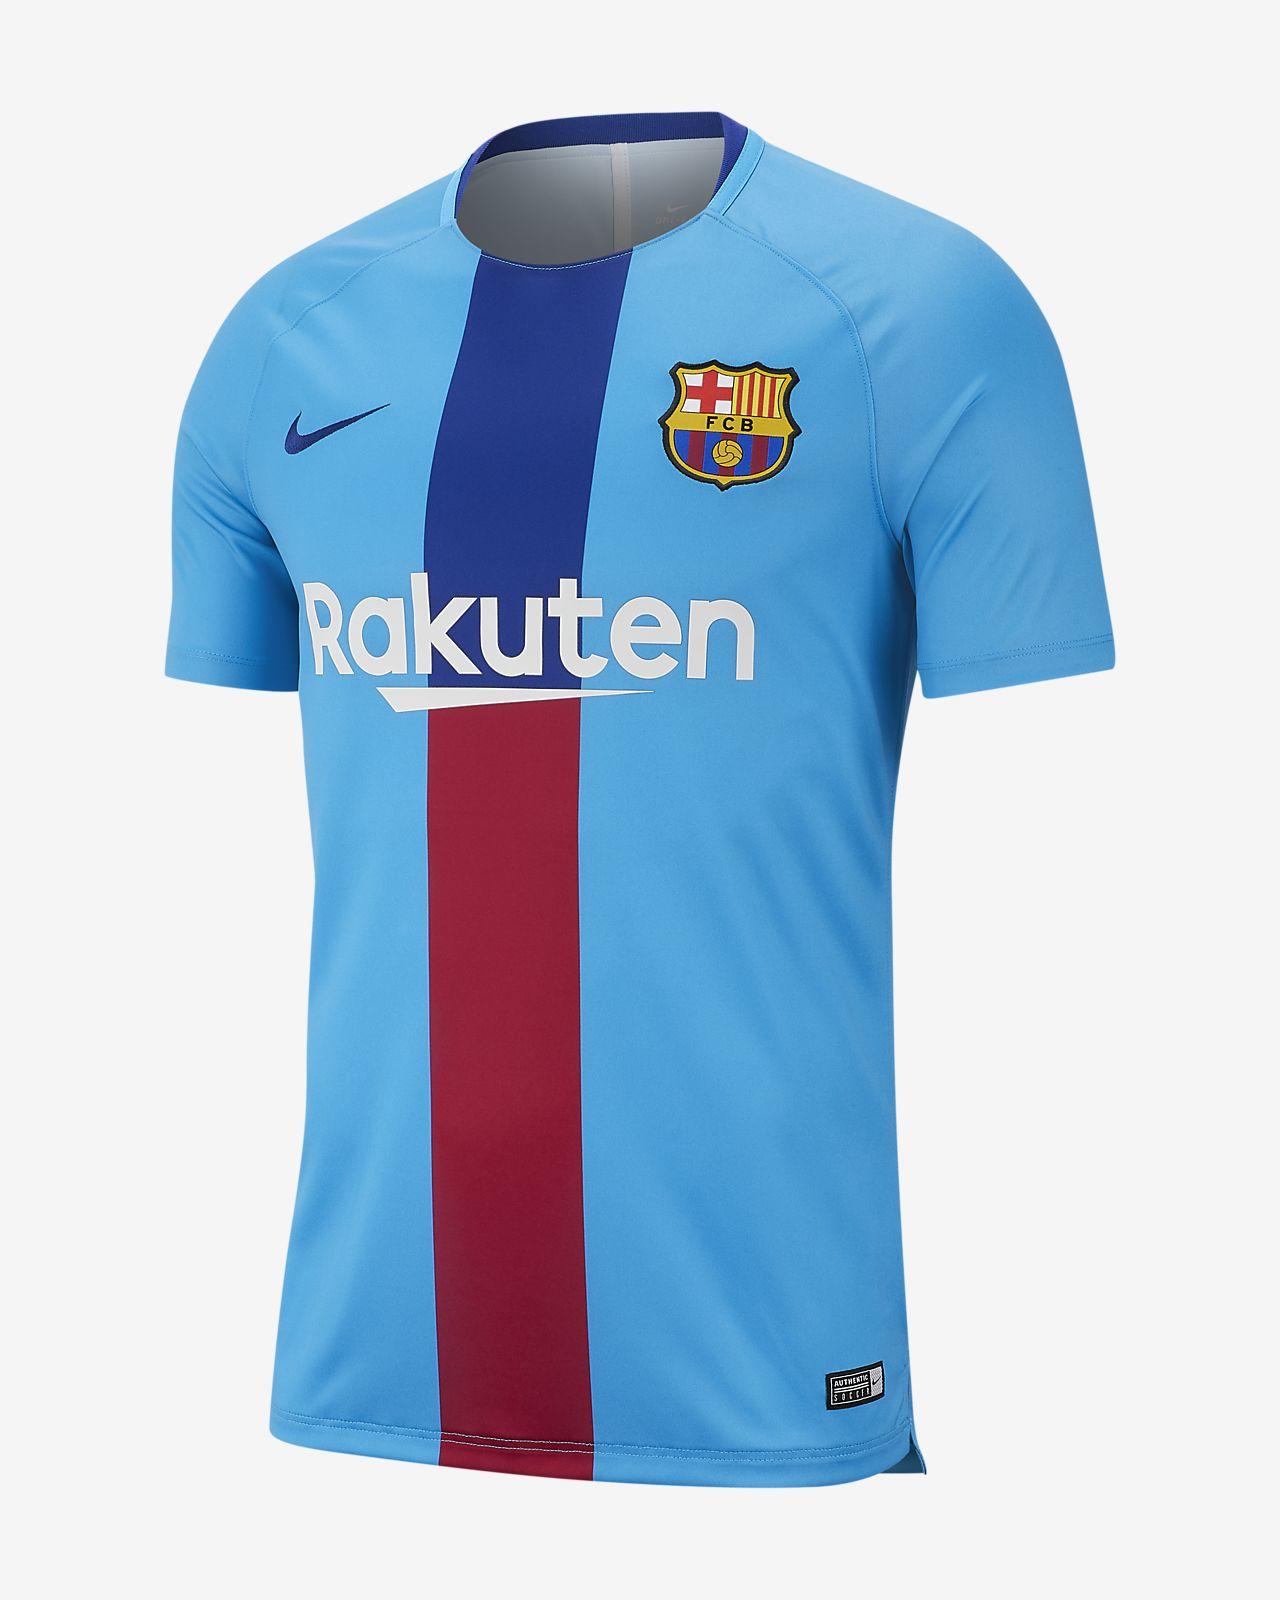 19cab21c589f Men s Short-Sleeve Graphic Football Top. Nike Dri-FIT FC Barcelona Squad